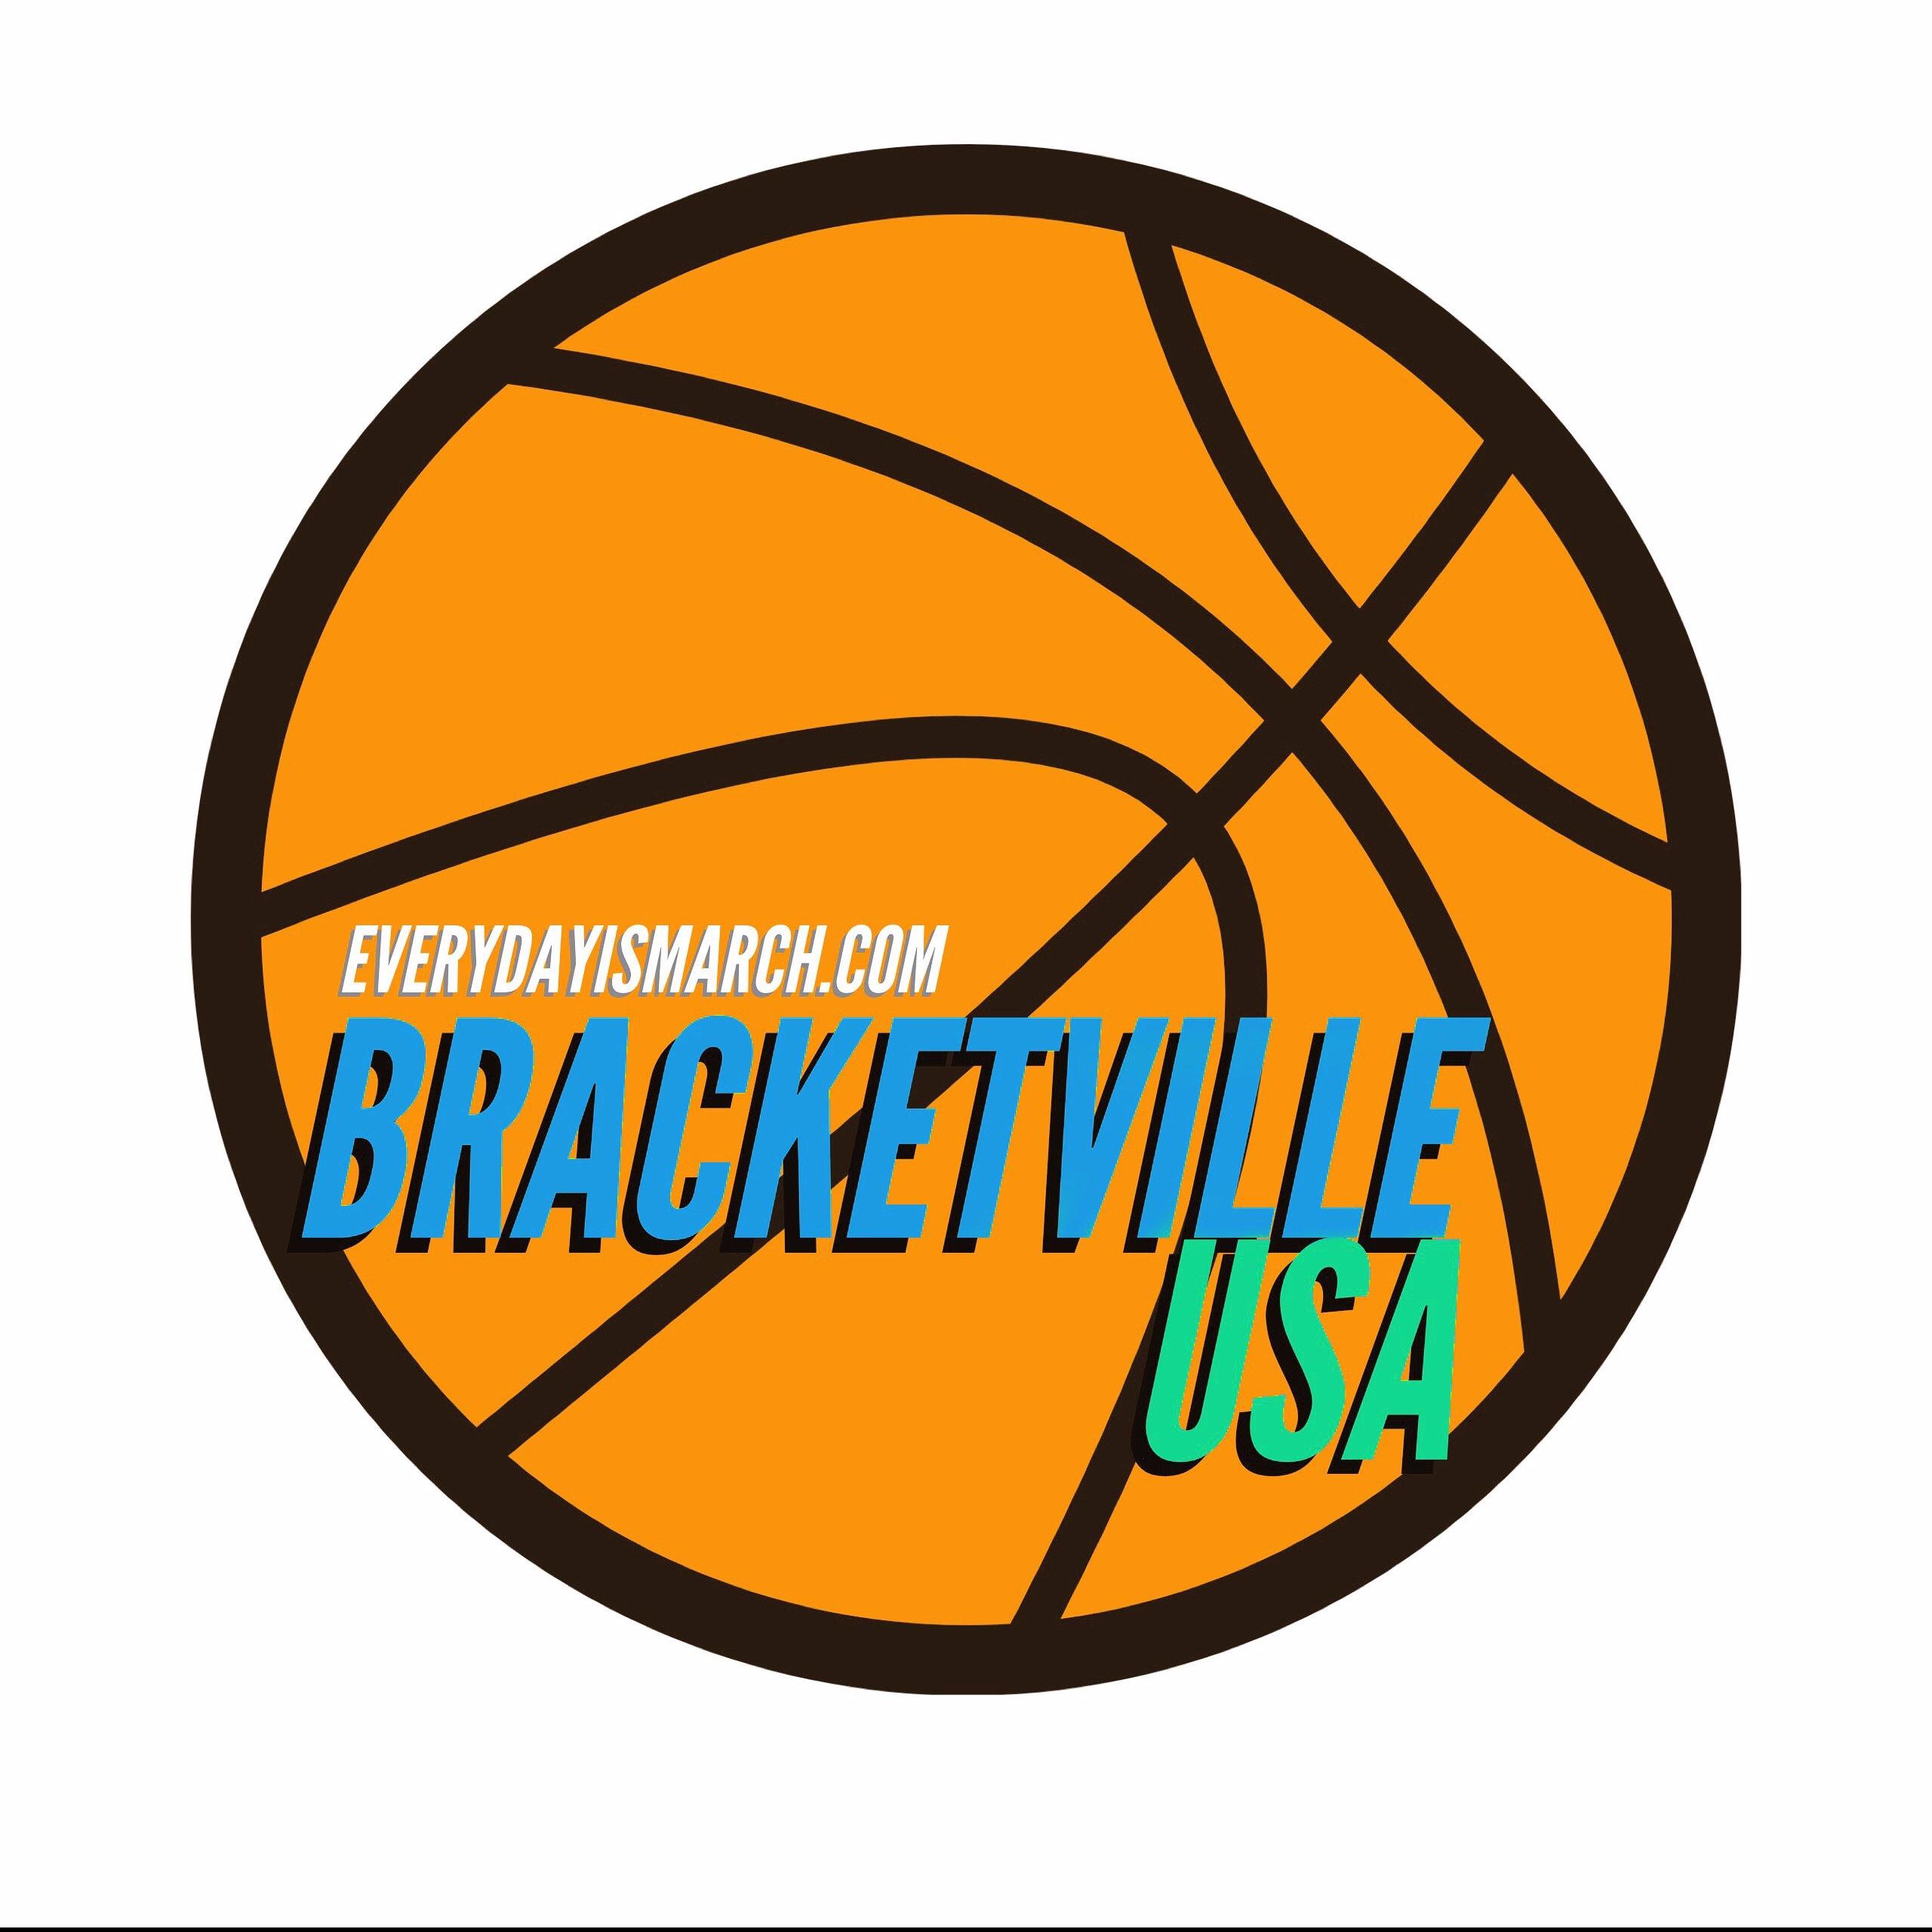 Bracketville USA